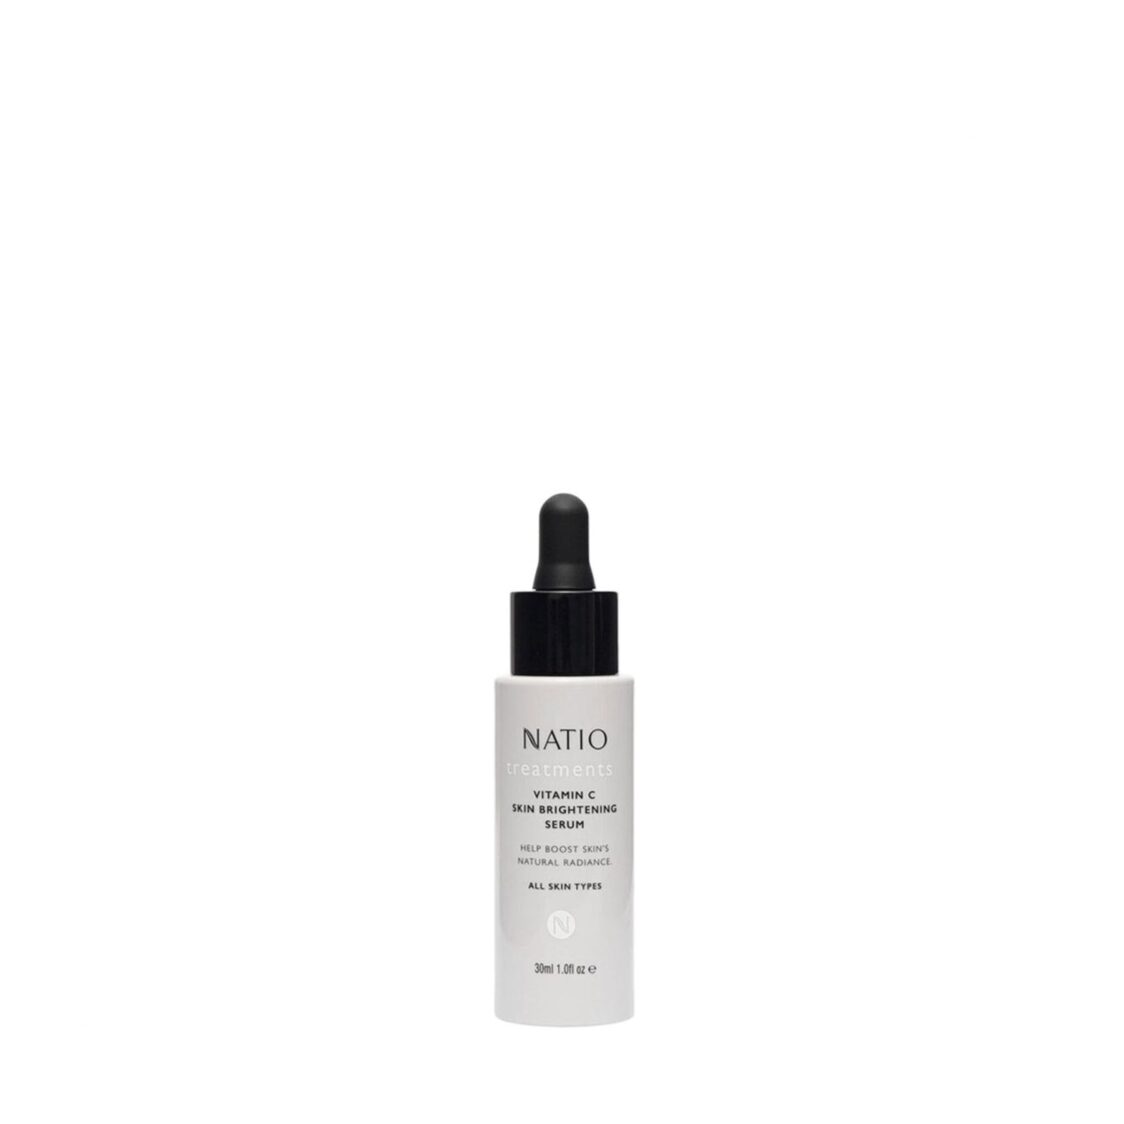 Natio Treatments Vitamin C Skin Brightening Serum 30ml